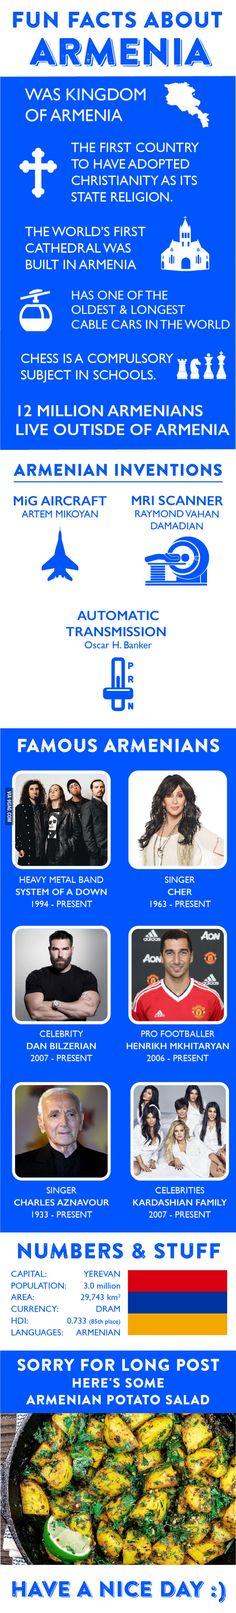 Fun Facts about Armenia - 9GAG